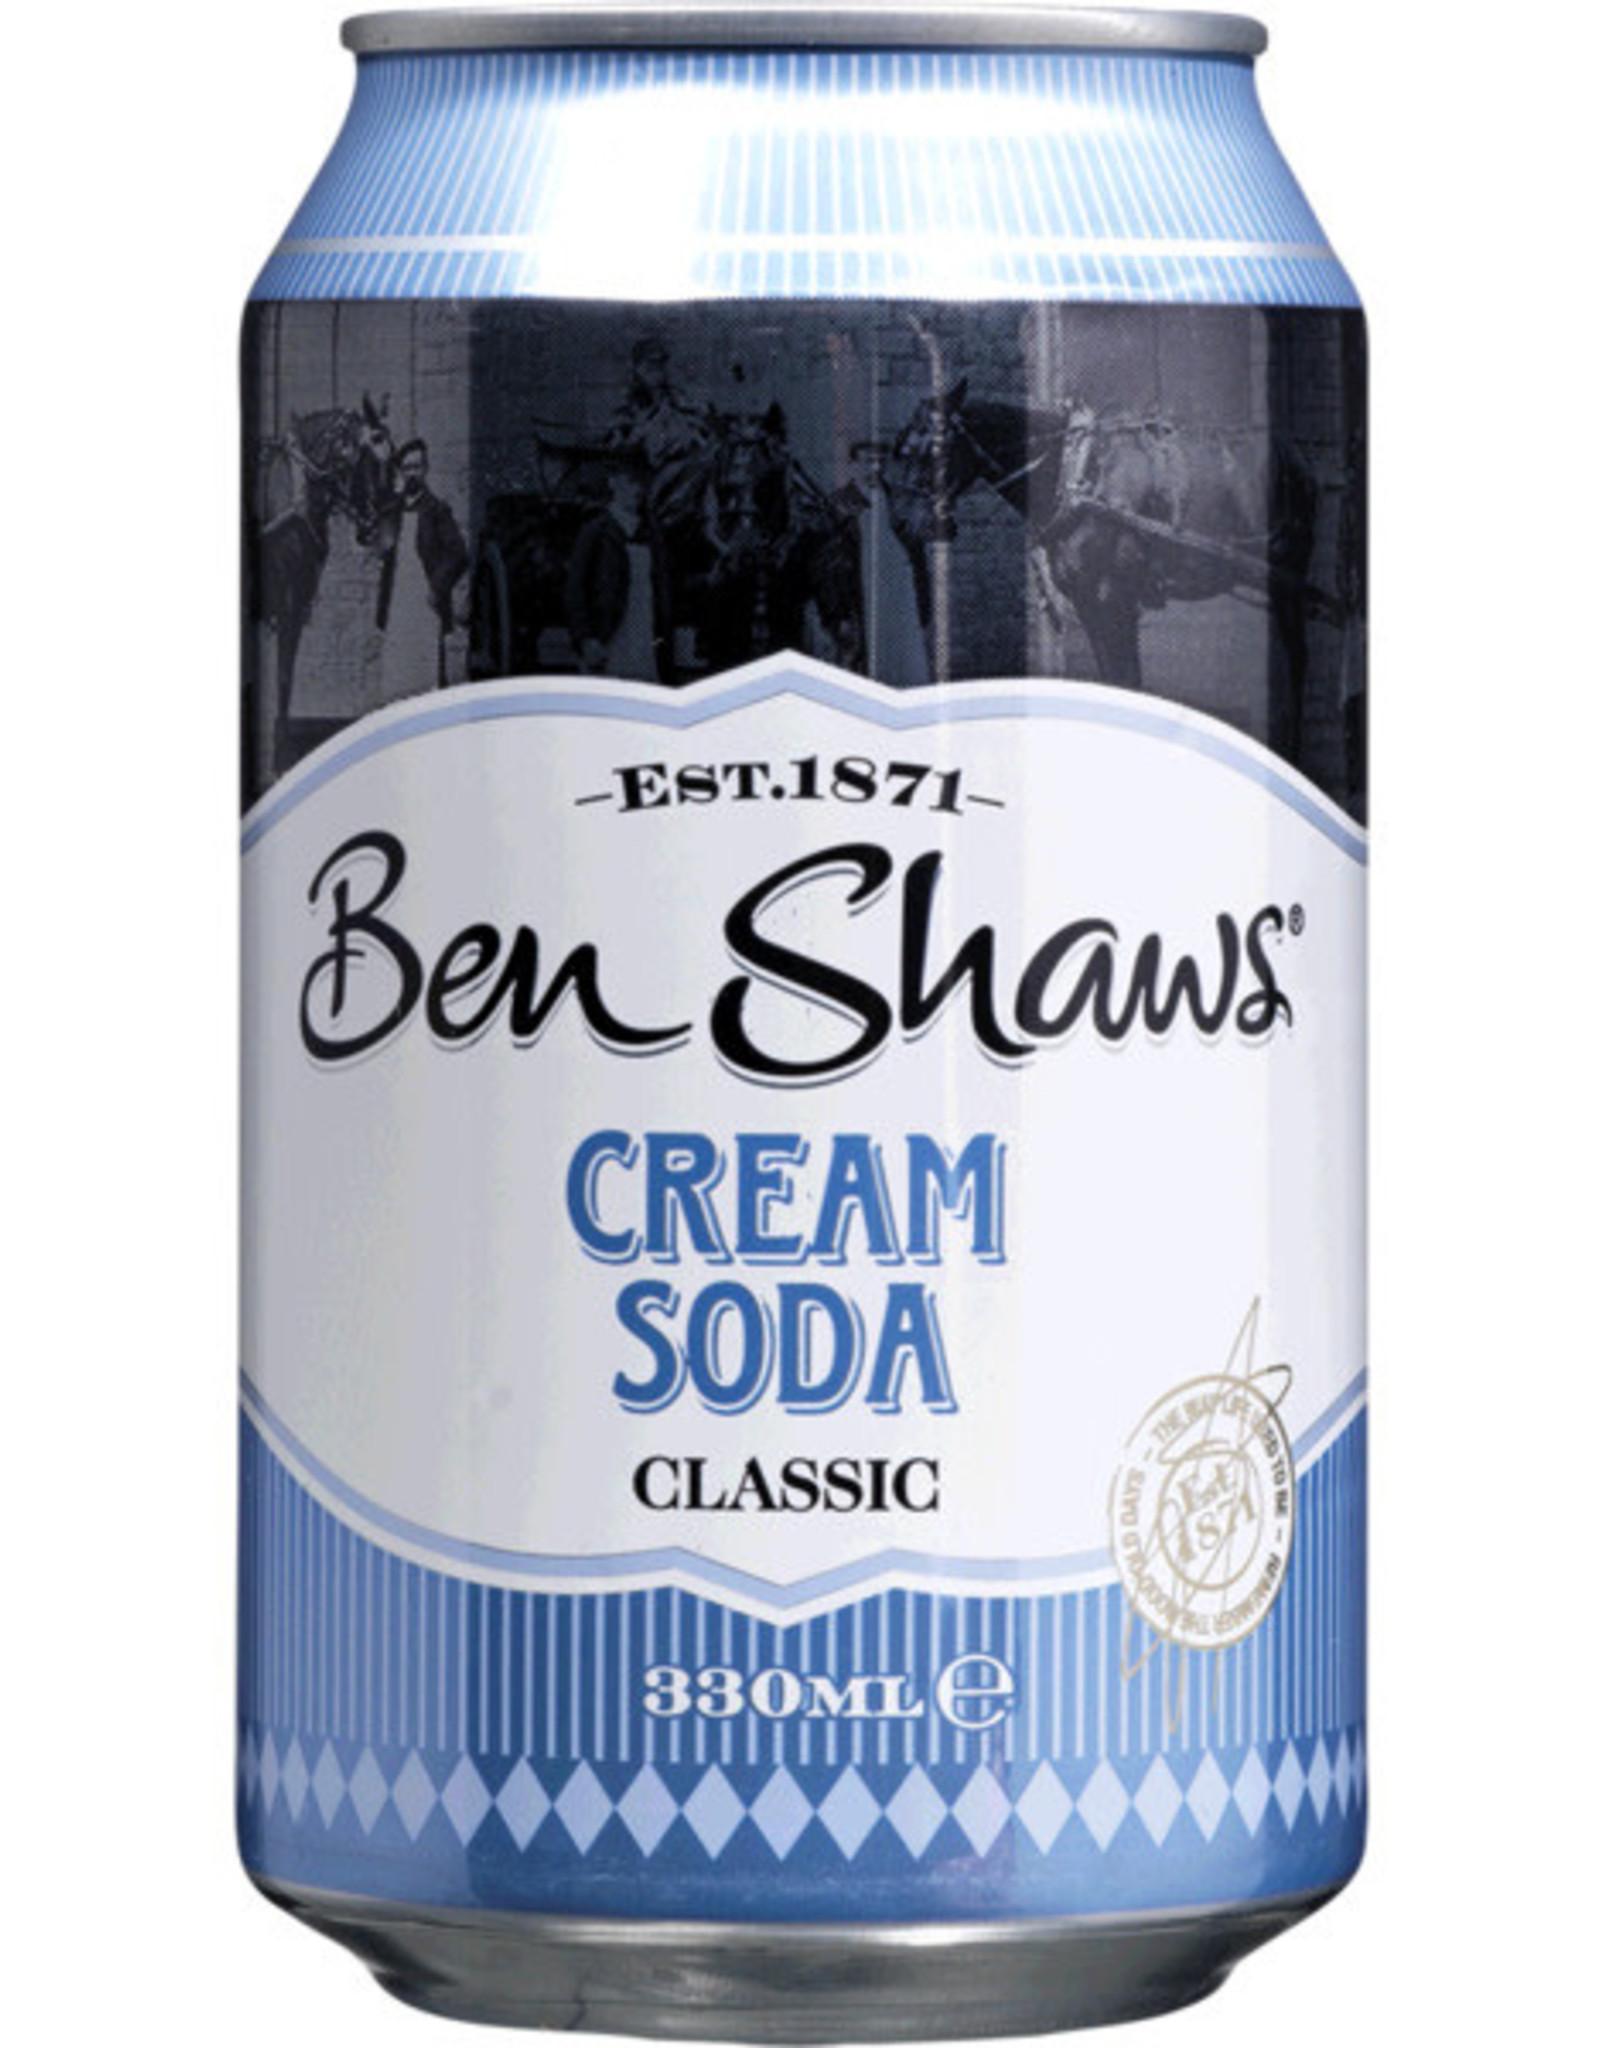 Ben Shaws' Ben Shaws' Cream Soda 33 cl